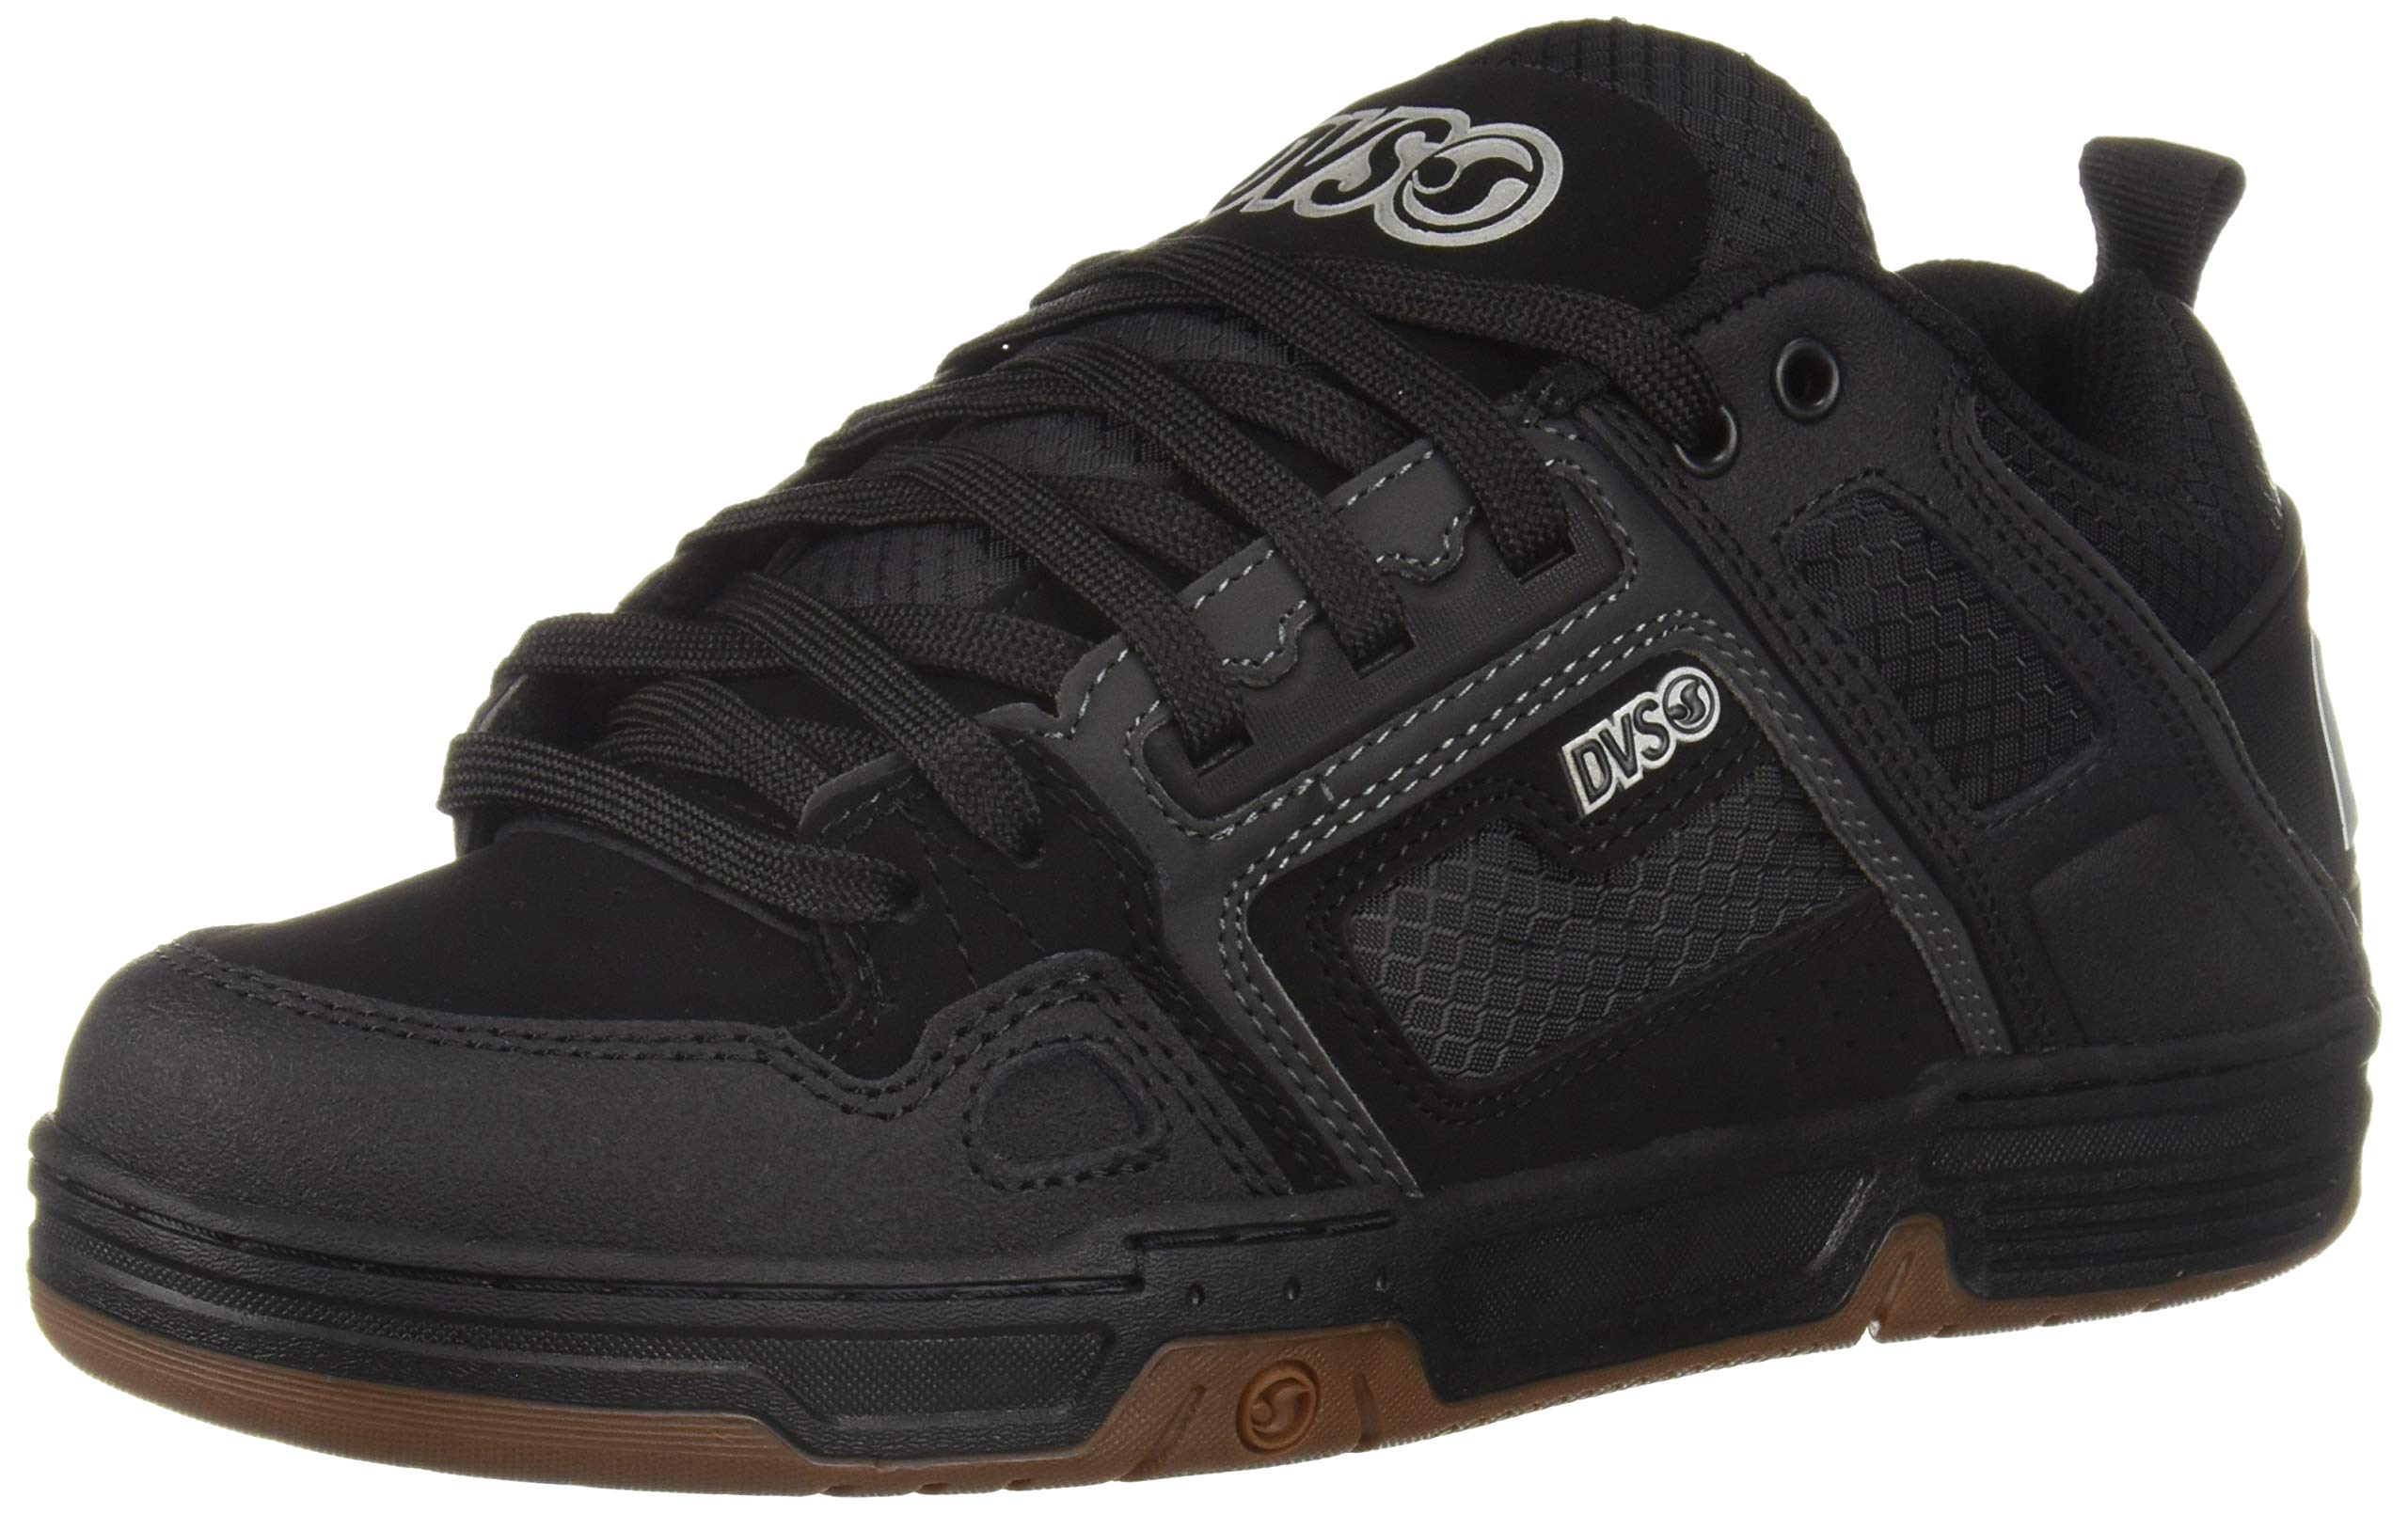 DVS Men's Comanche Skate Shoe Black/White Gum Nubuck 10 Medium US